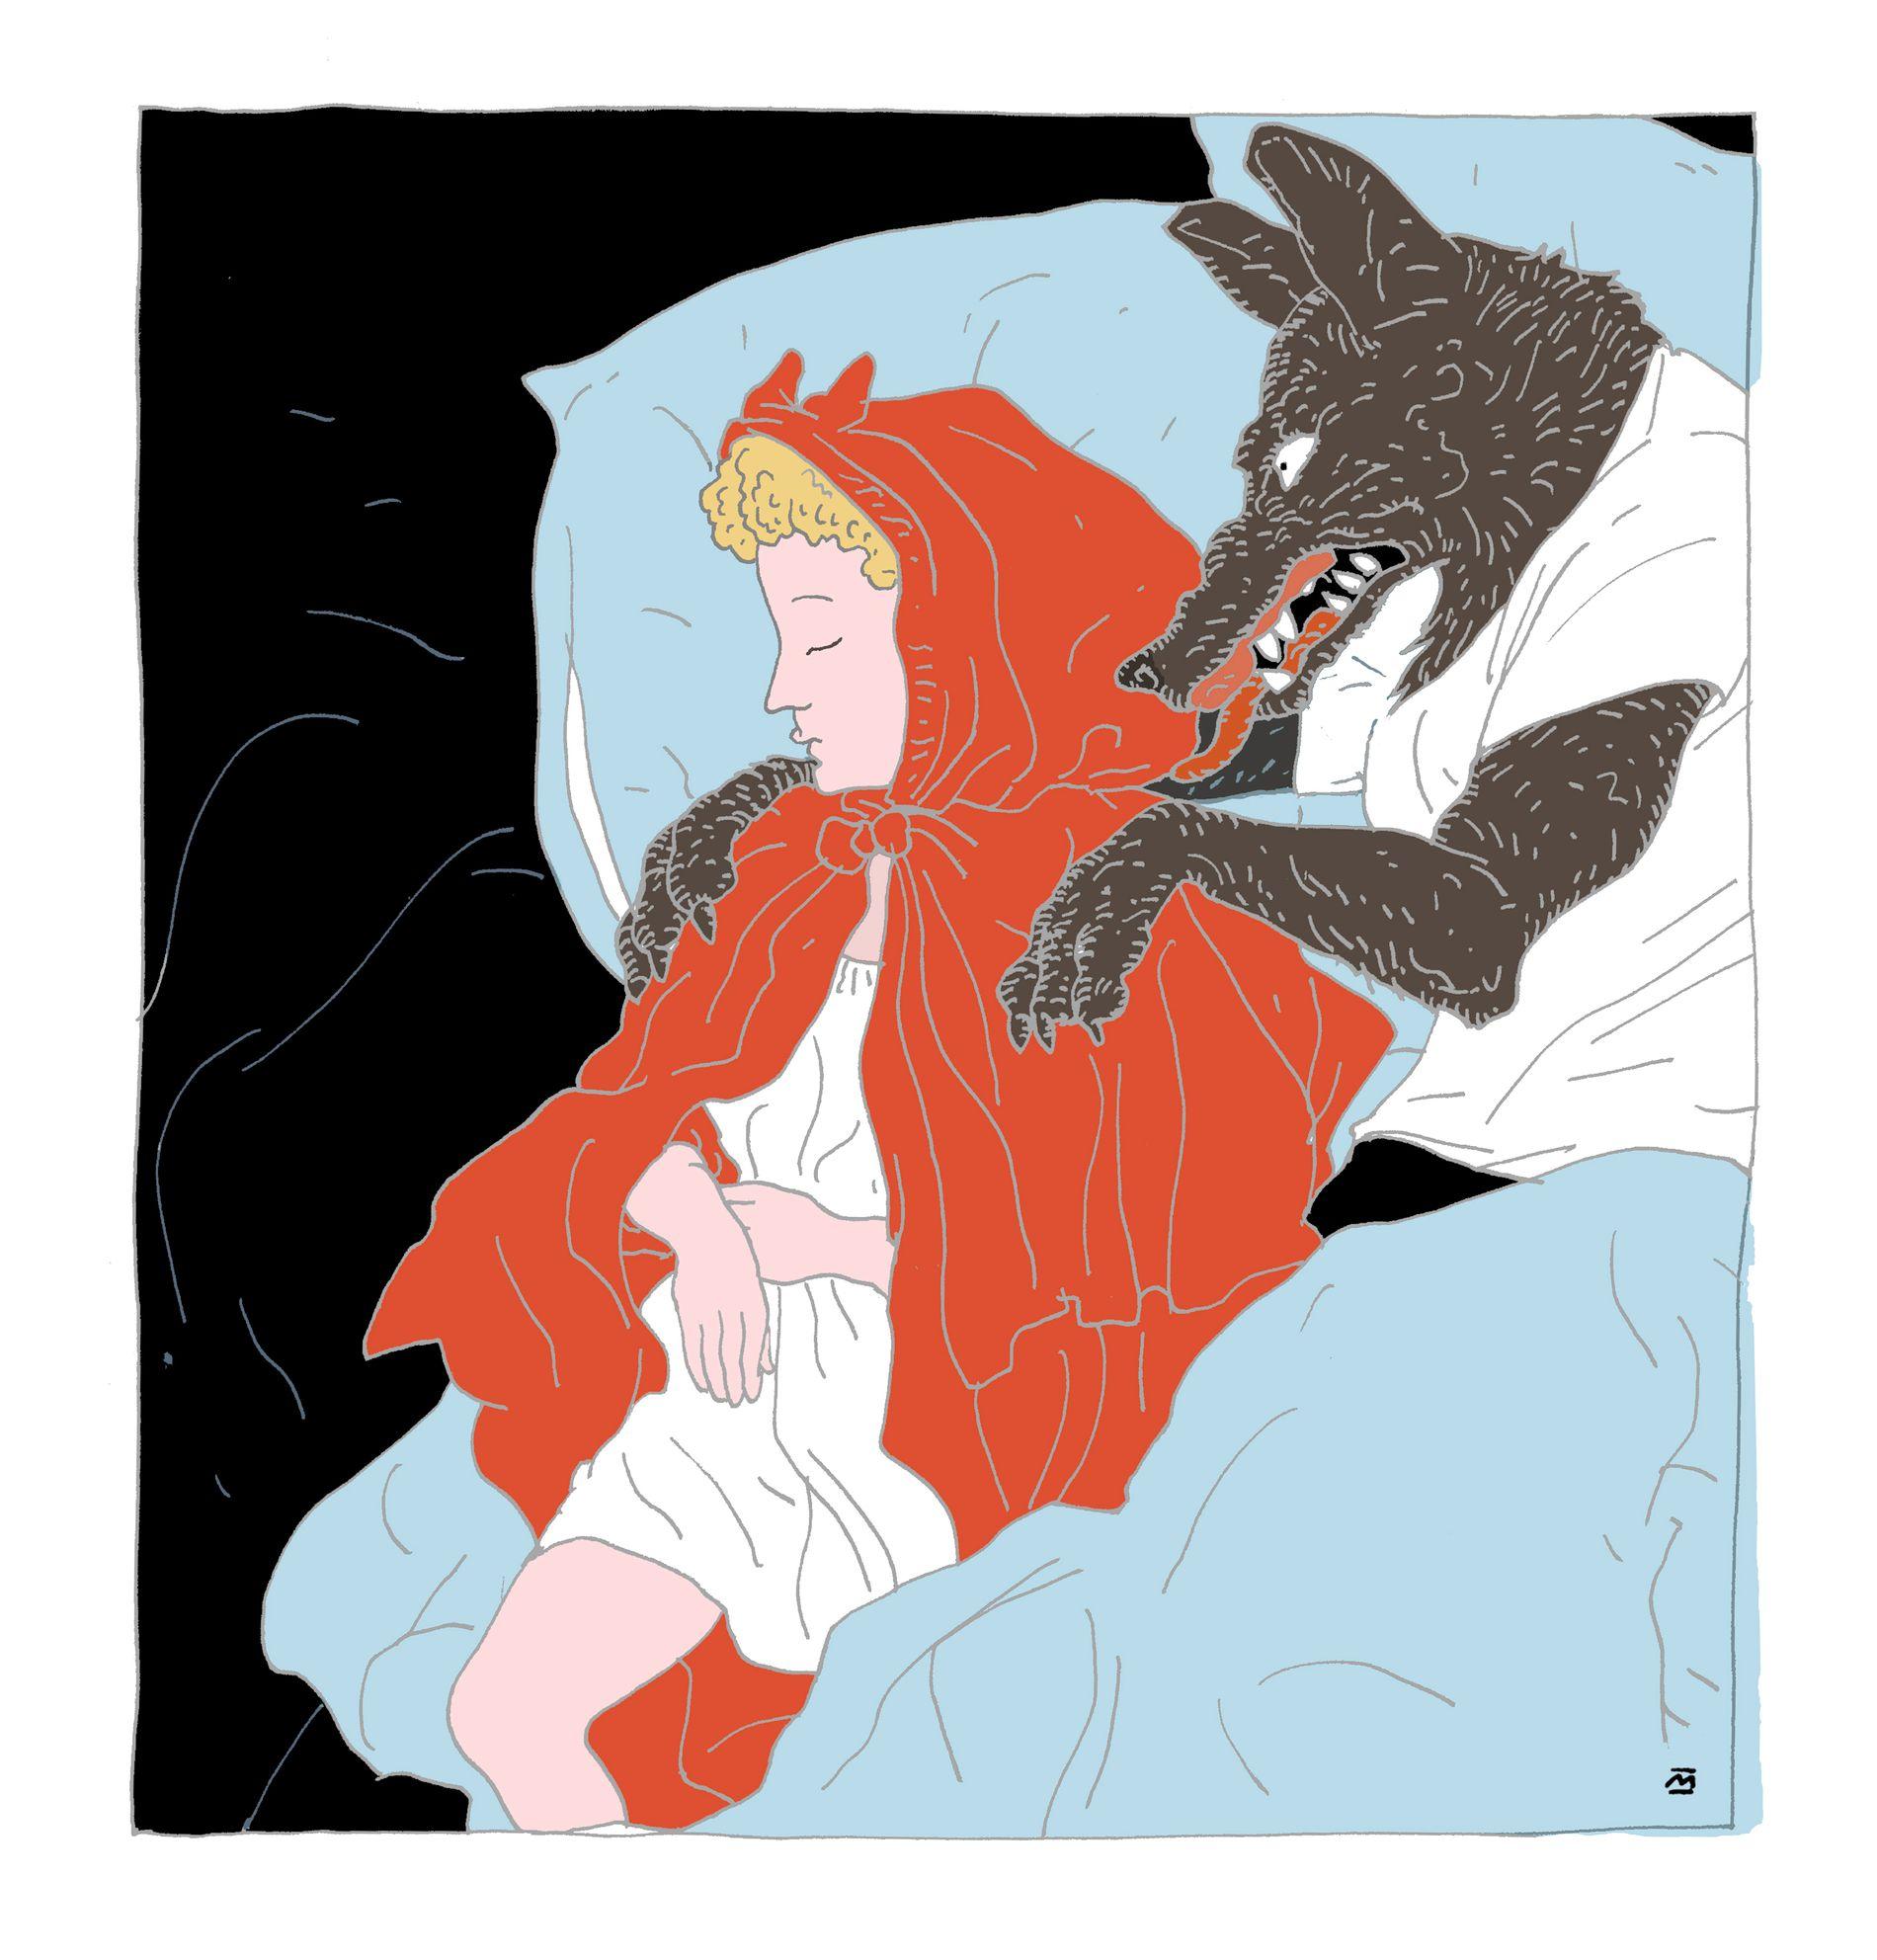 DIFFUSE GRENSER: Grensene mellom voldtekt og frivillig sex er ofte diffus, skriver Eirin Eikefjord.